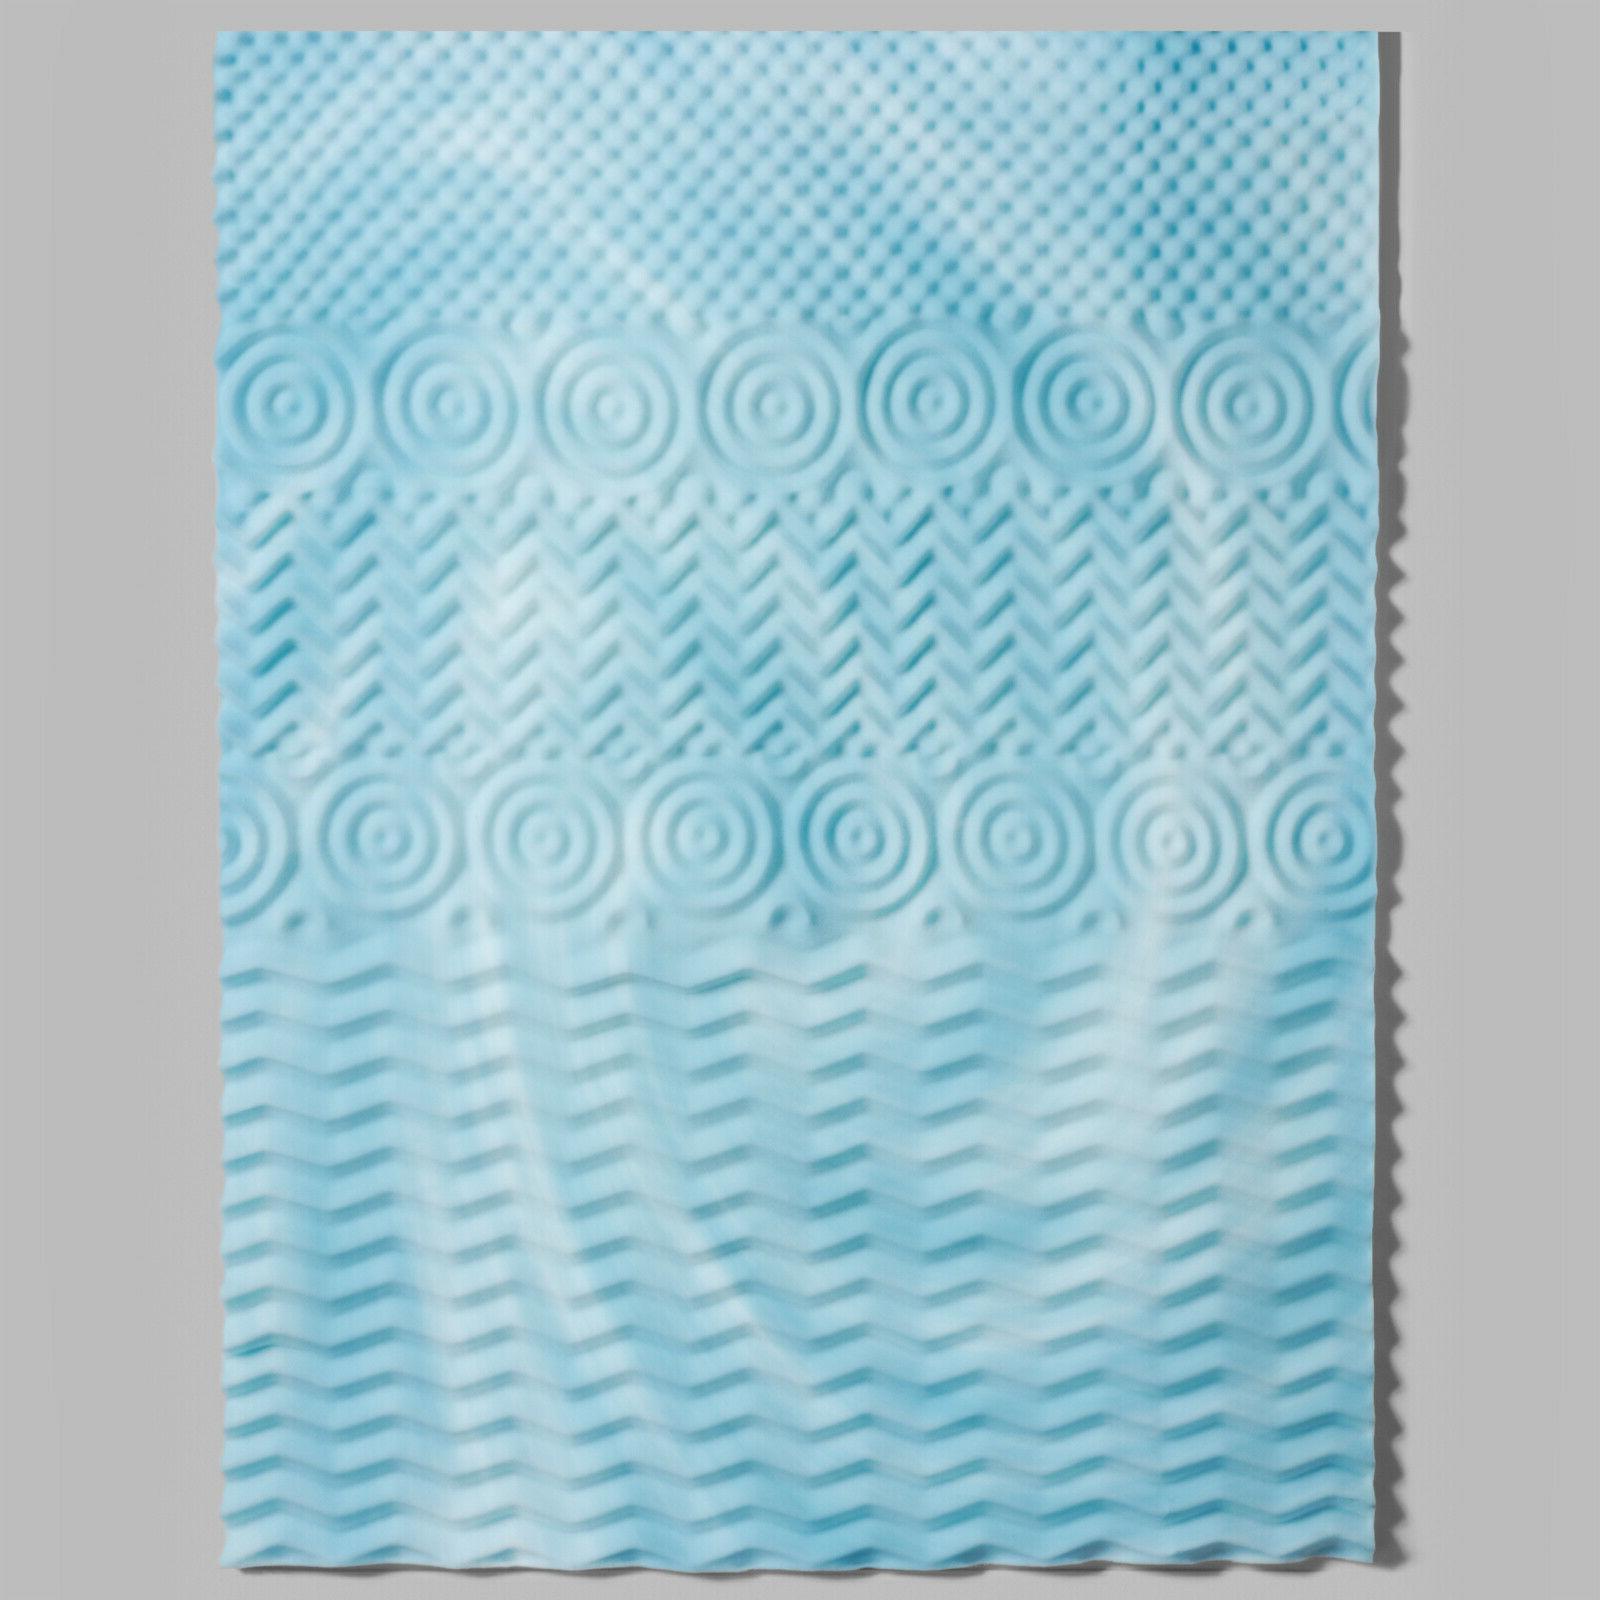 Cooling Mattress Topper Memory Foam Cover King